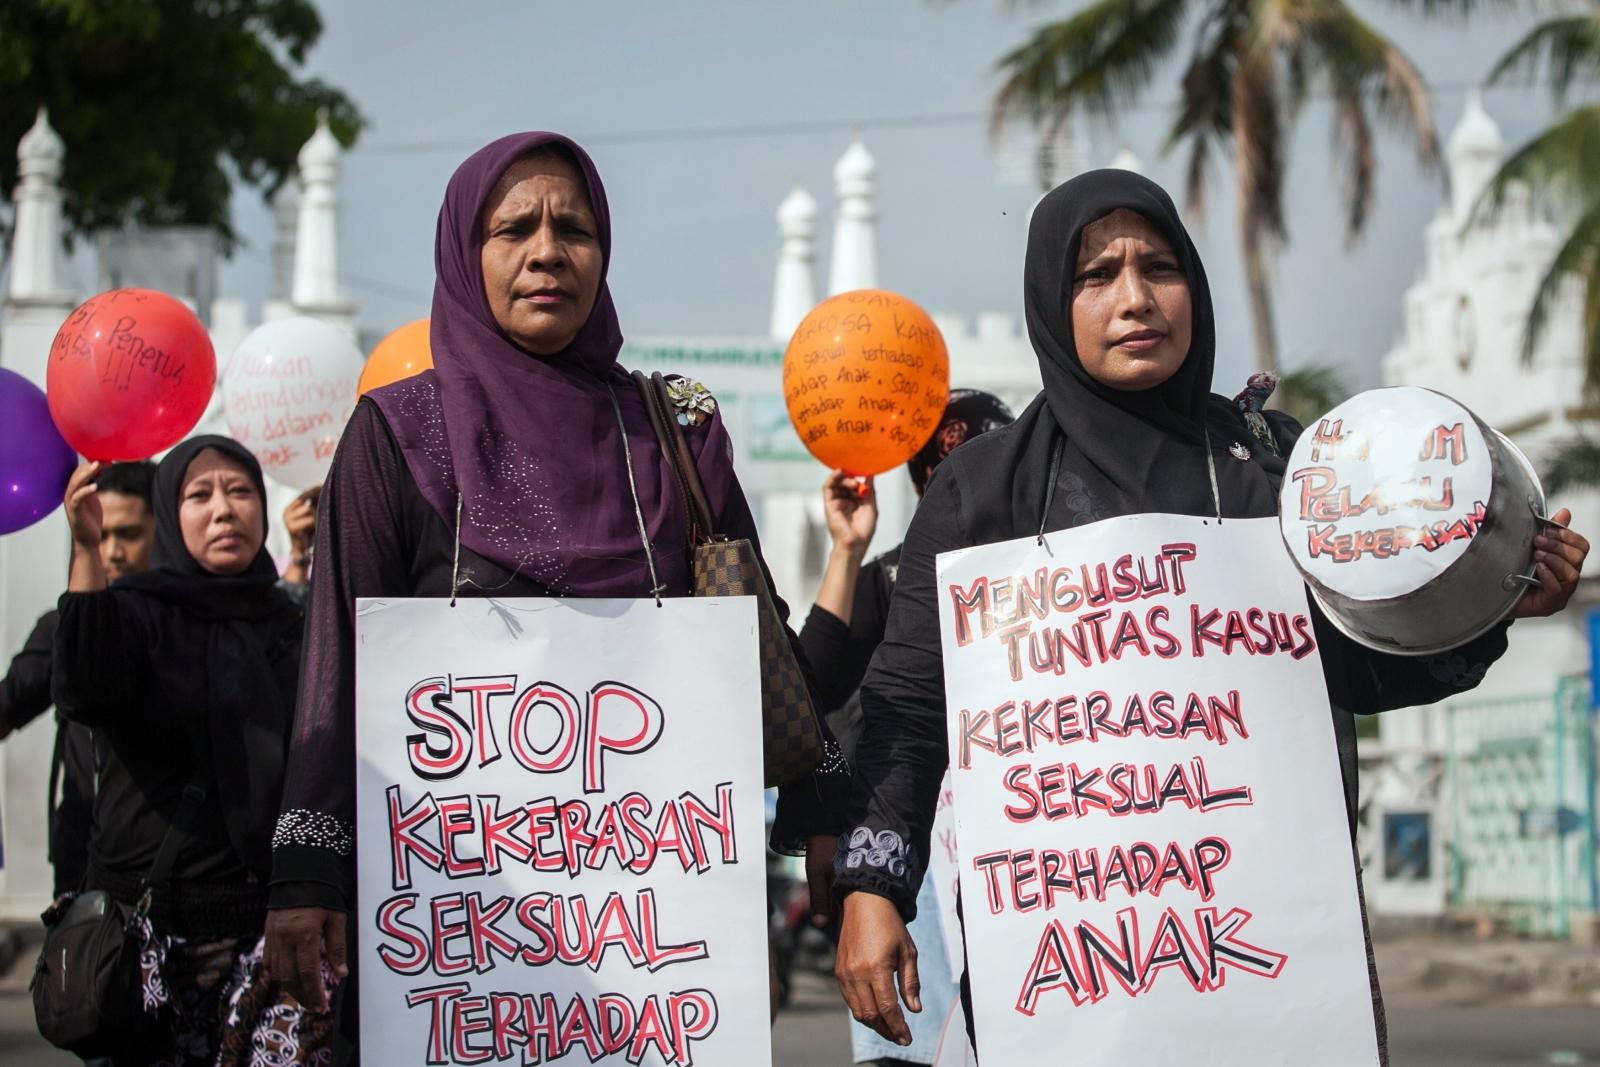 Indonesia paedophiles